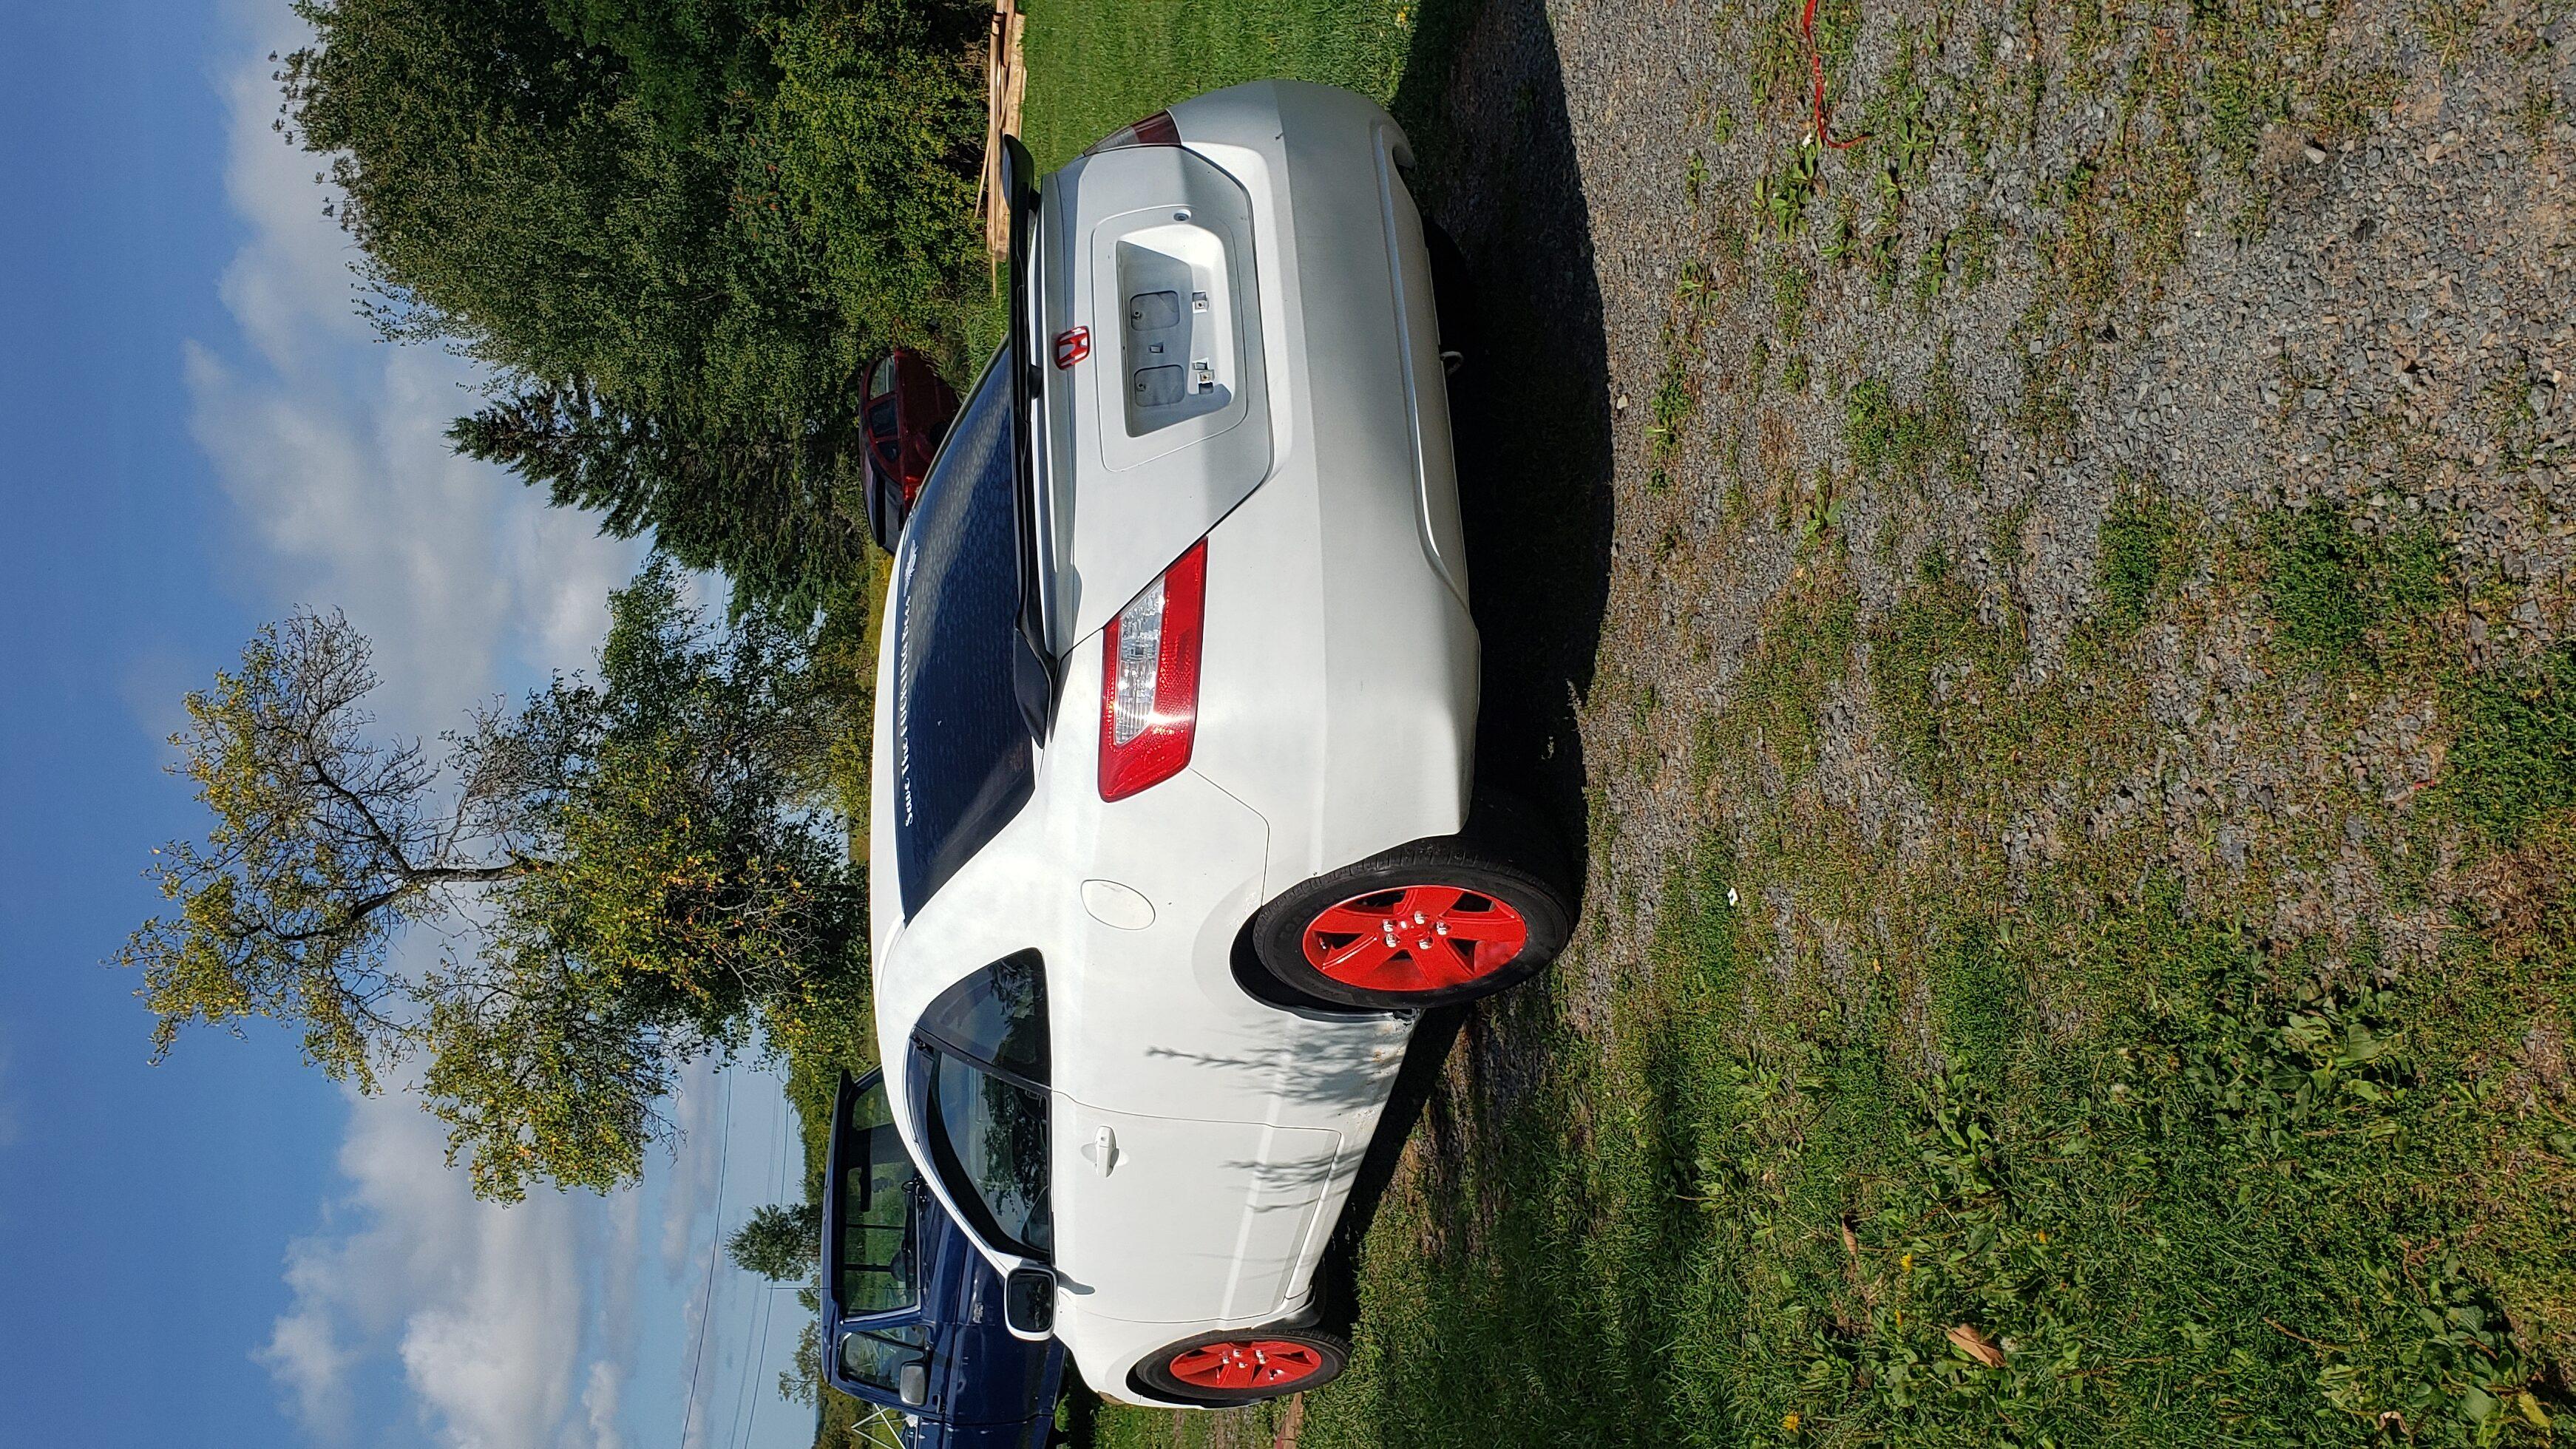 2006 White Honda Civic paint job/ complete make over